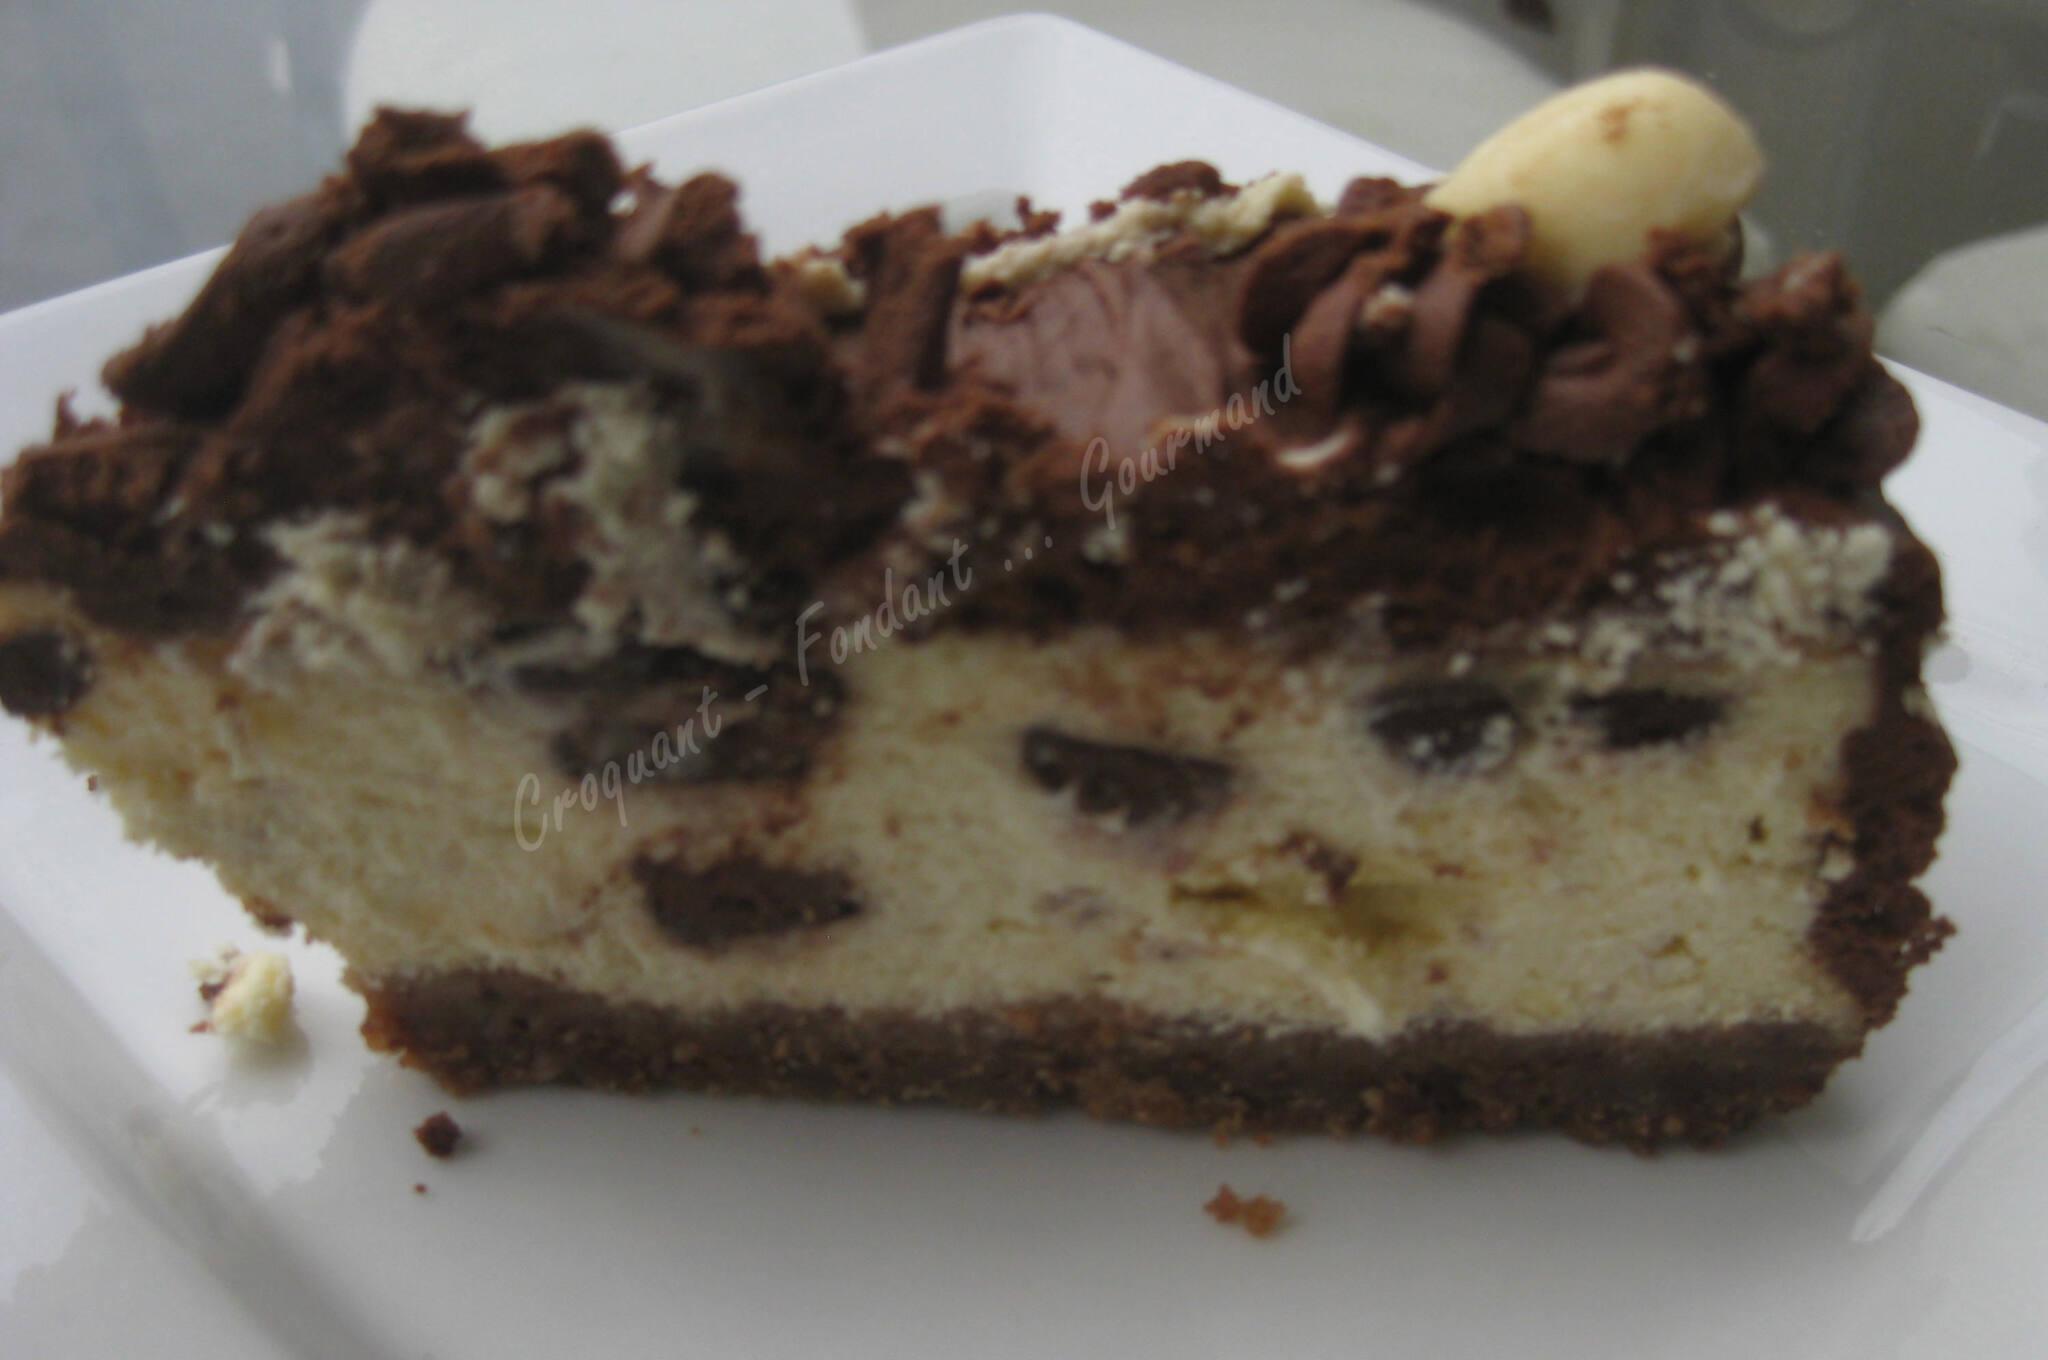 Cheesecake au chocolat - Croquant Fondant Gourmand